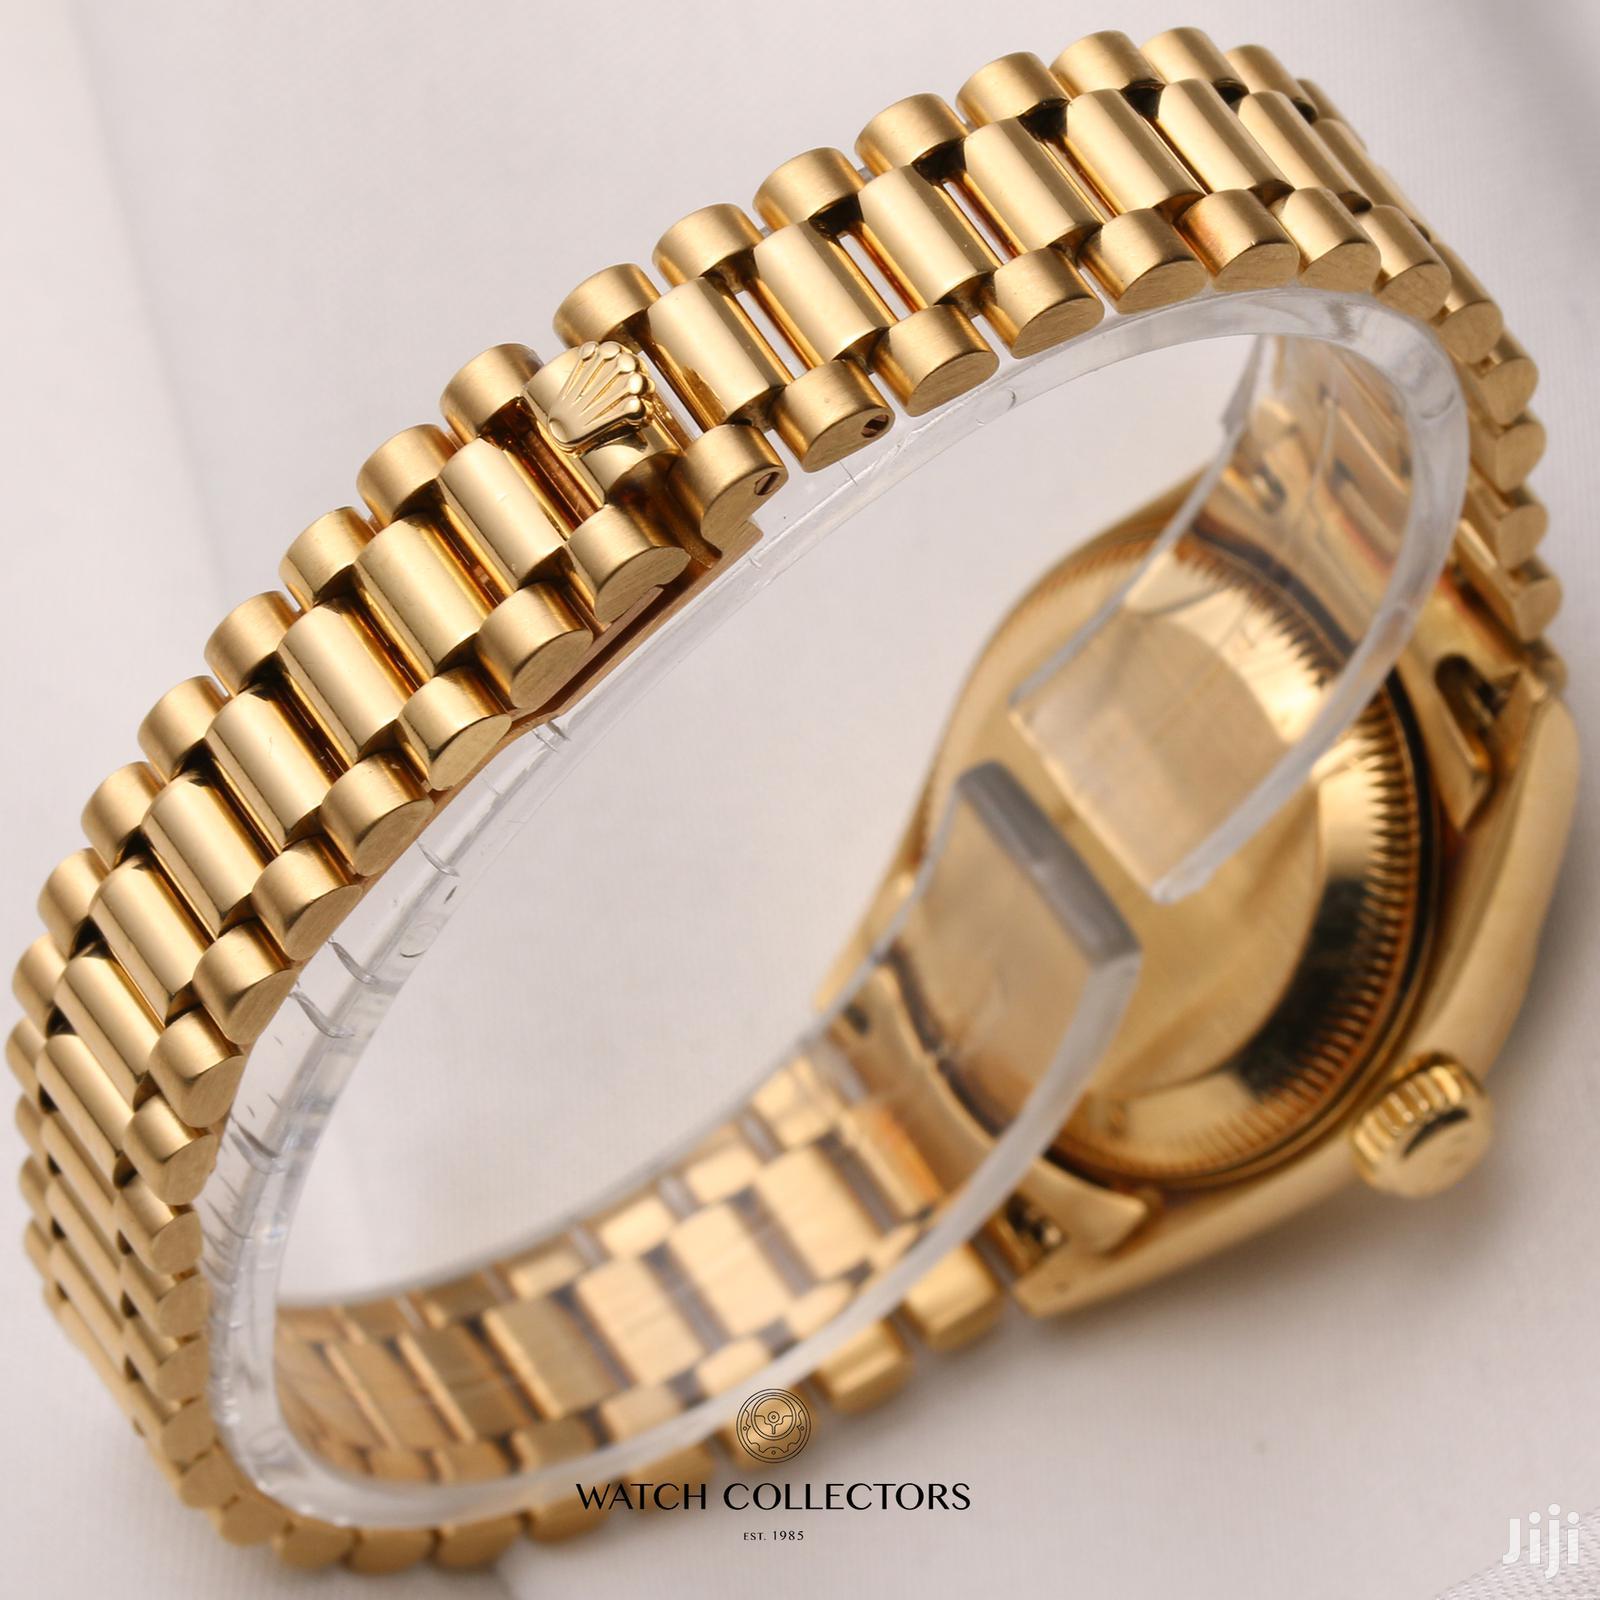 Rolex Red Diamond Fashionable Watch